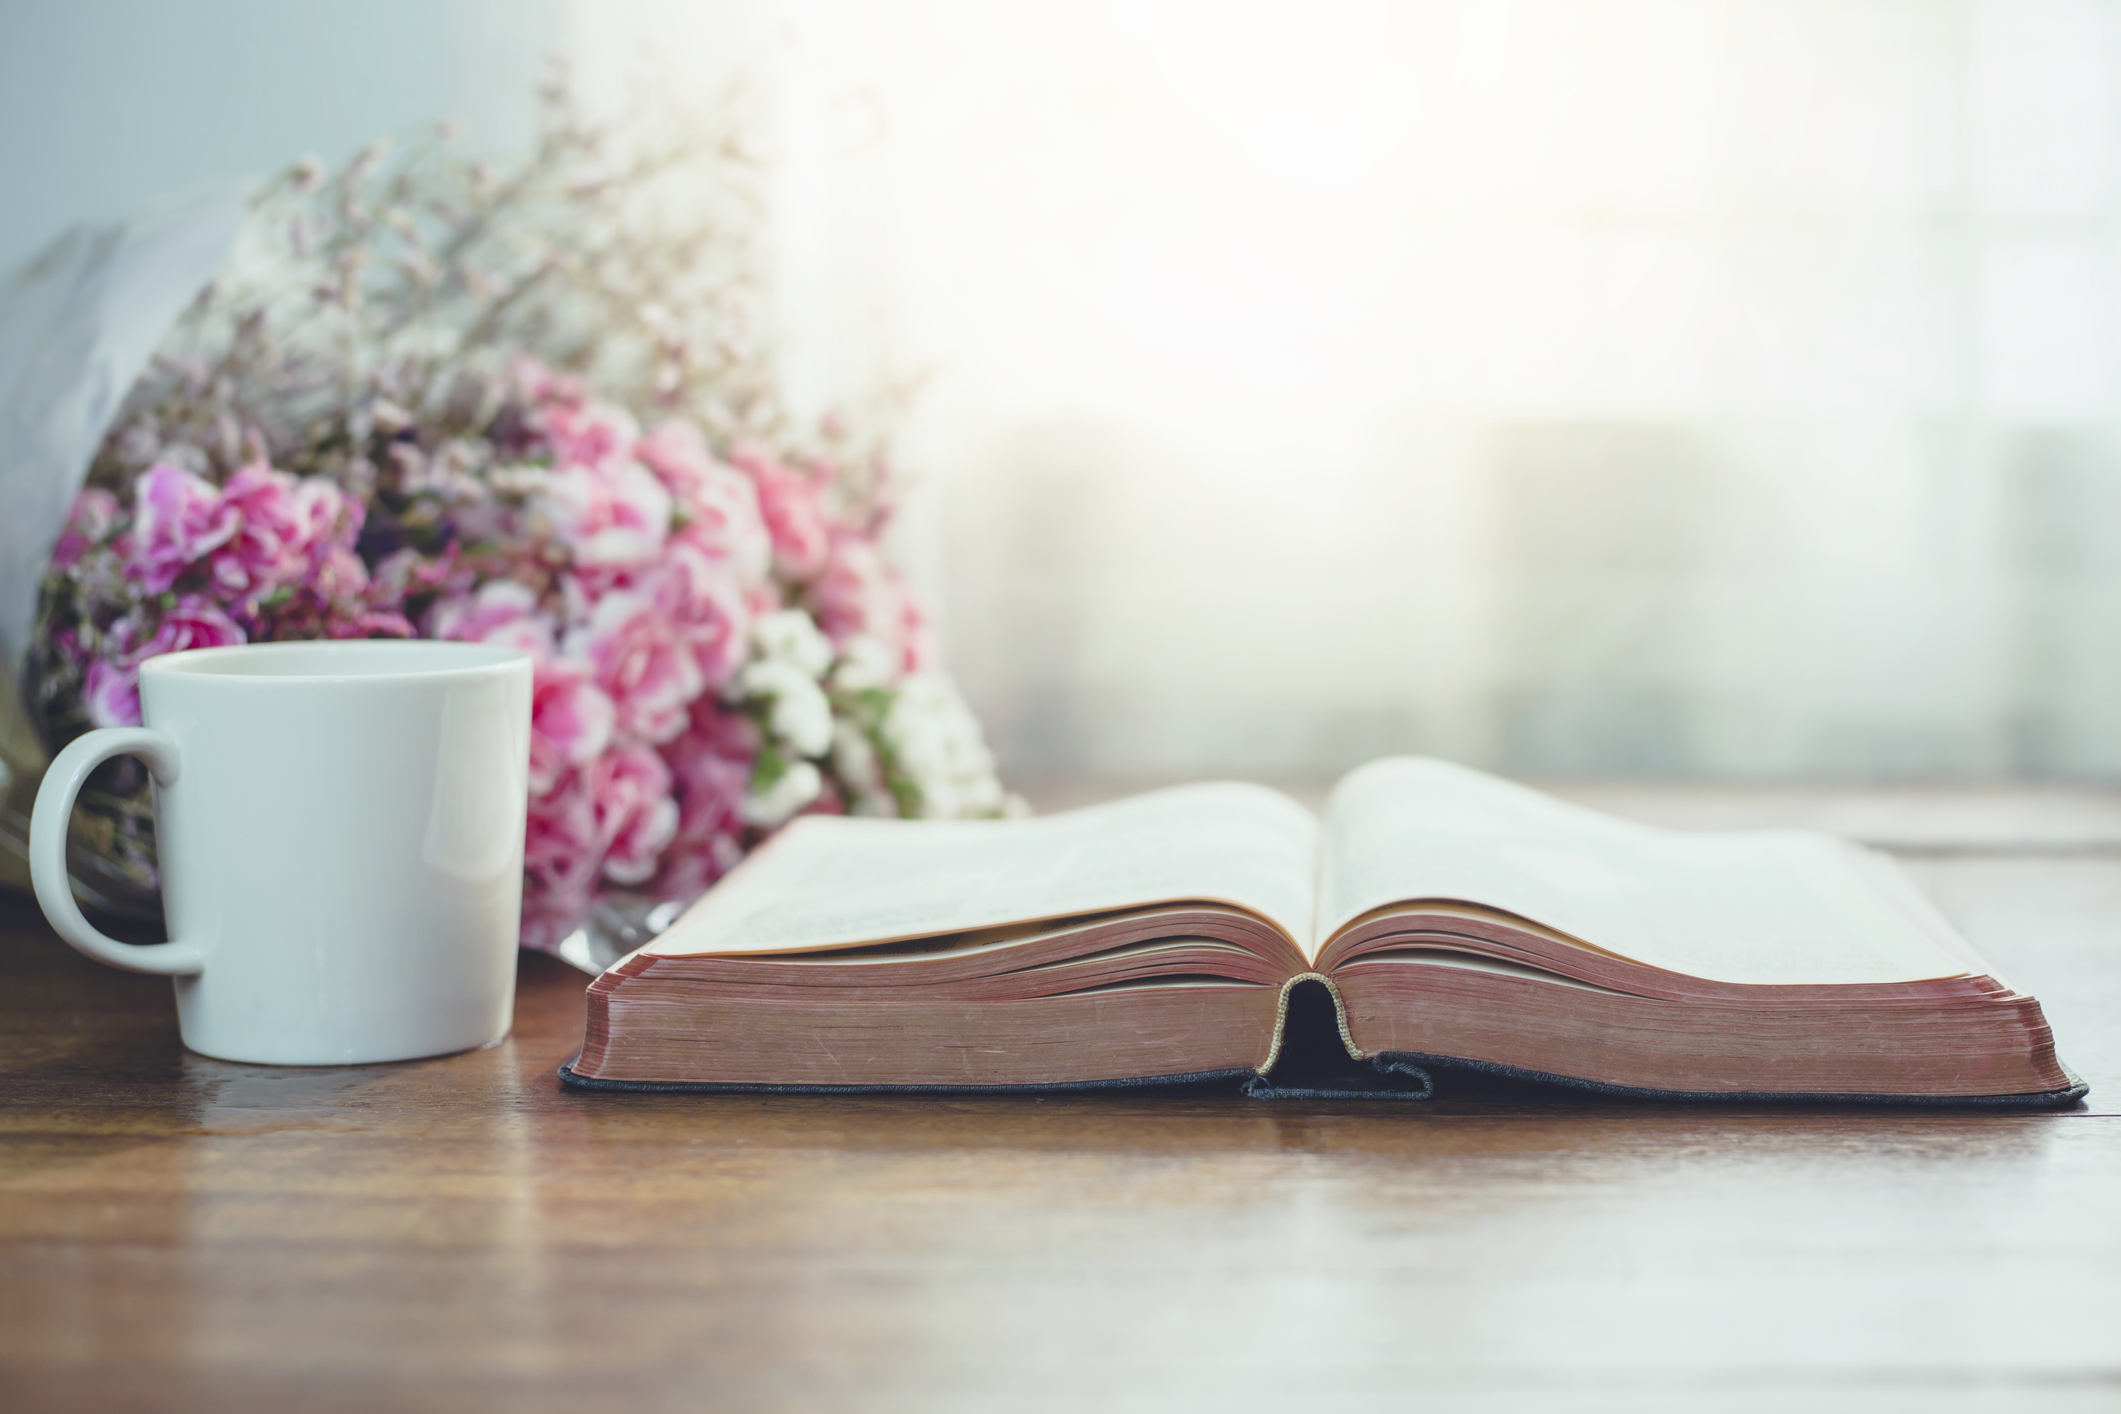 Women's Ministry Summer 2021 Bible Studies